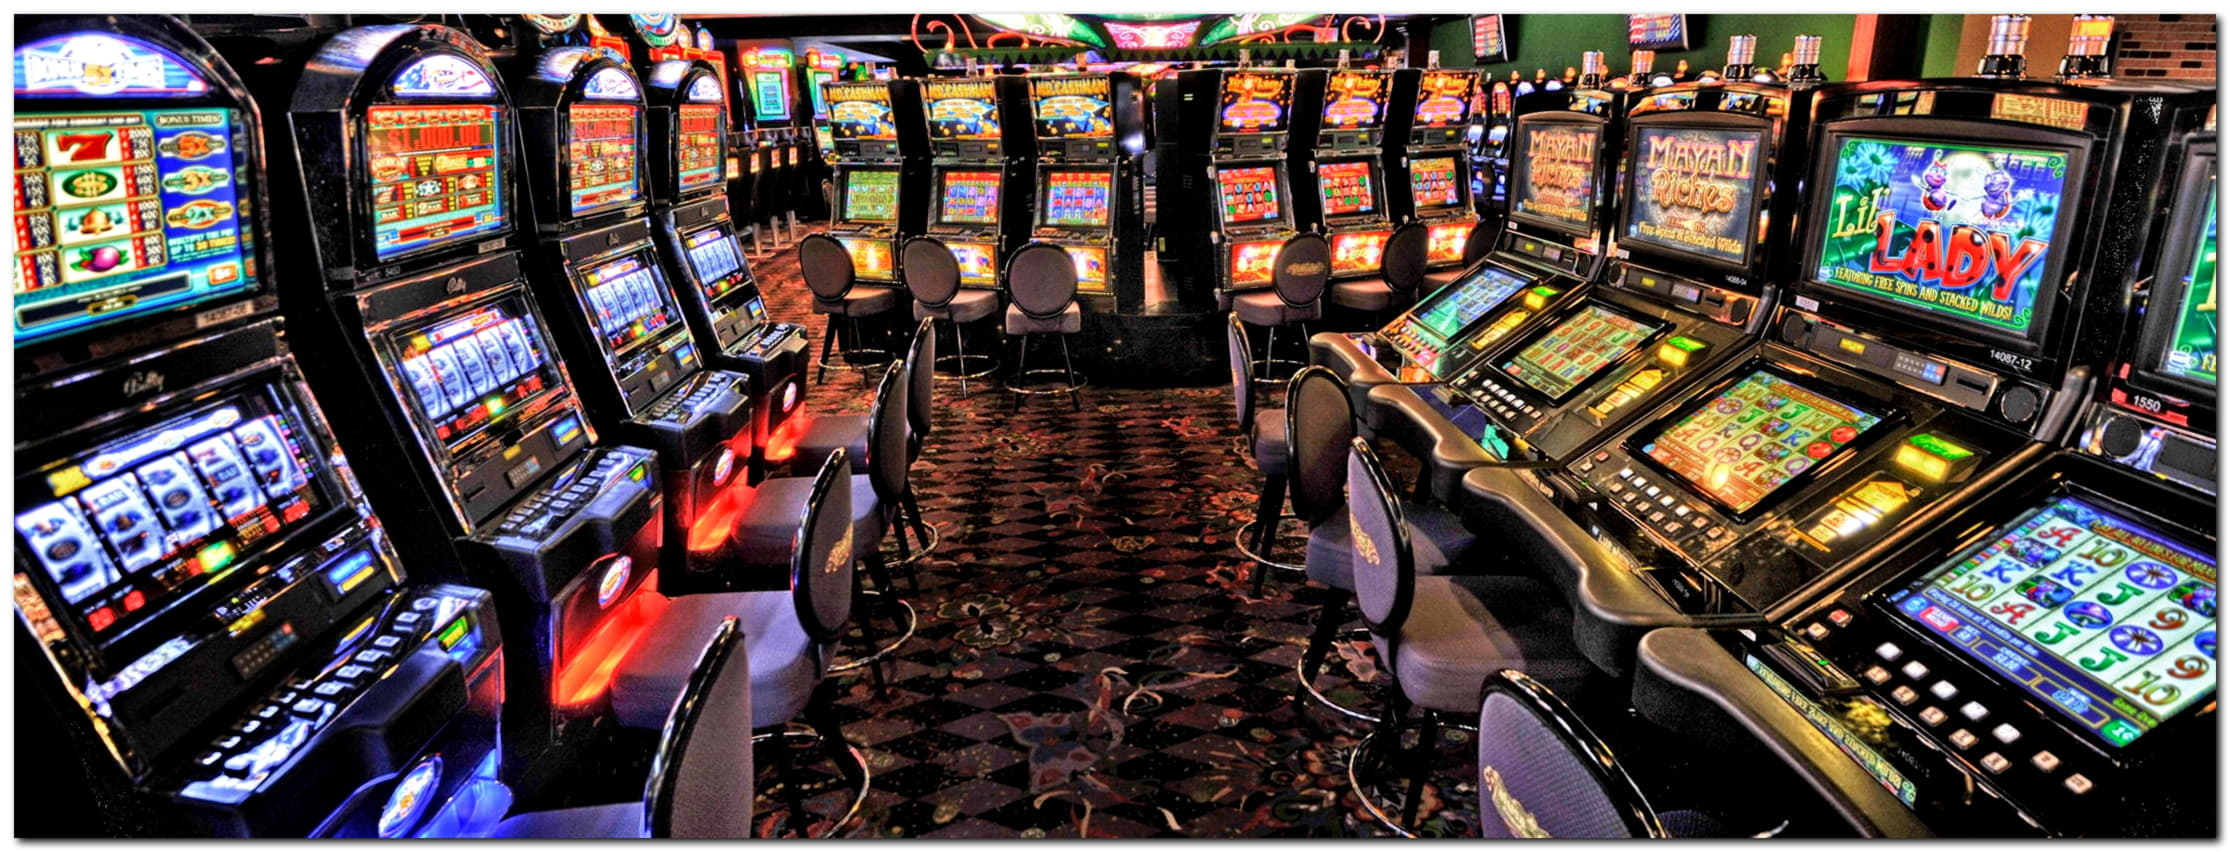 90 Free Casino Spins at Cherry Casino